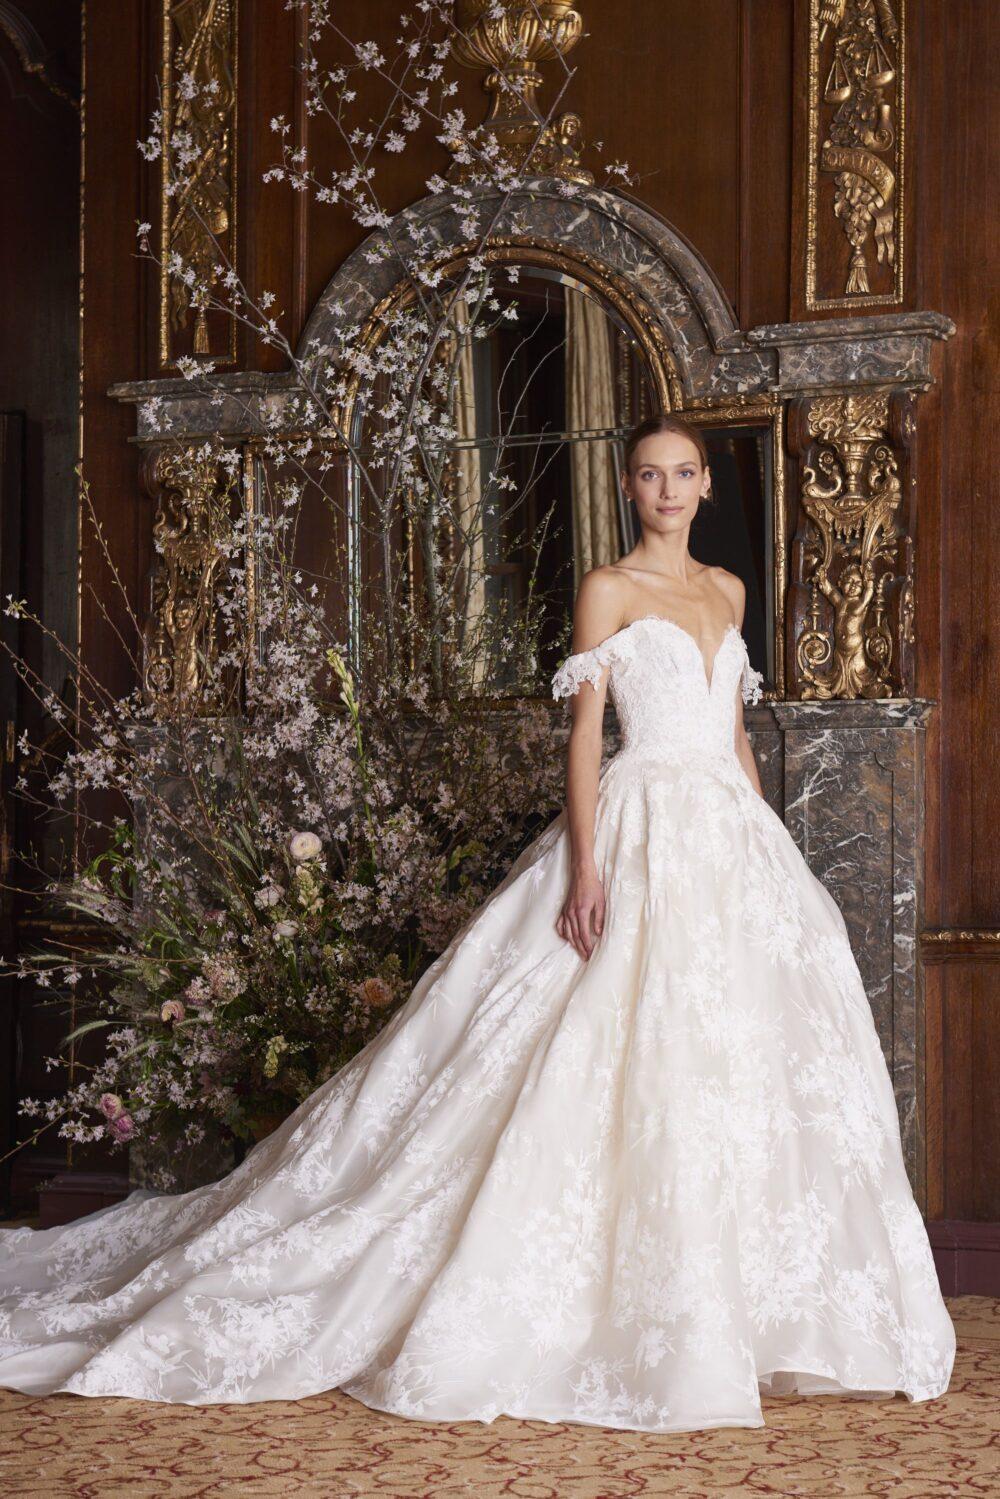 10 Best Wedding Dress Designers For 2020 Royal Wedding